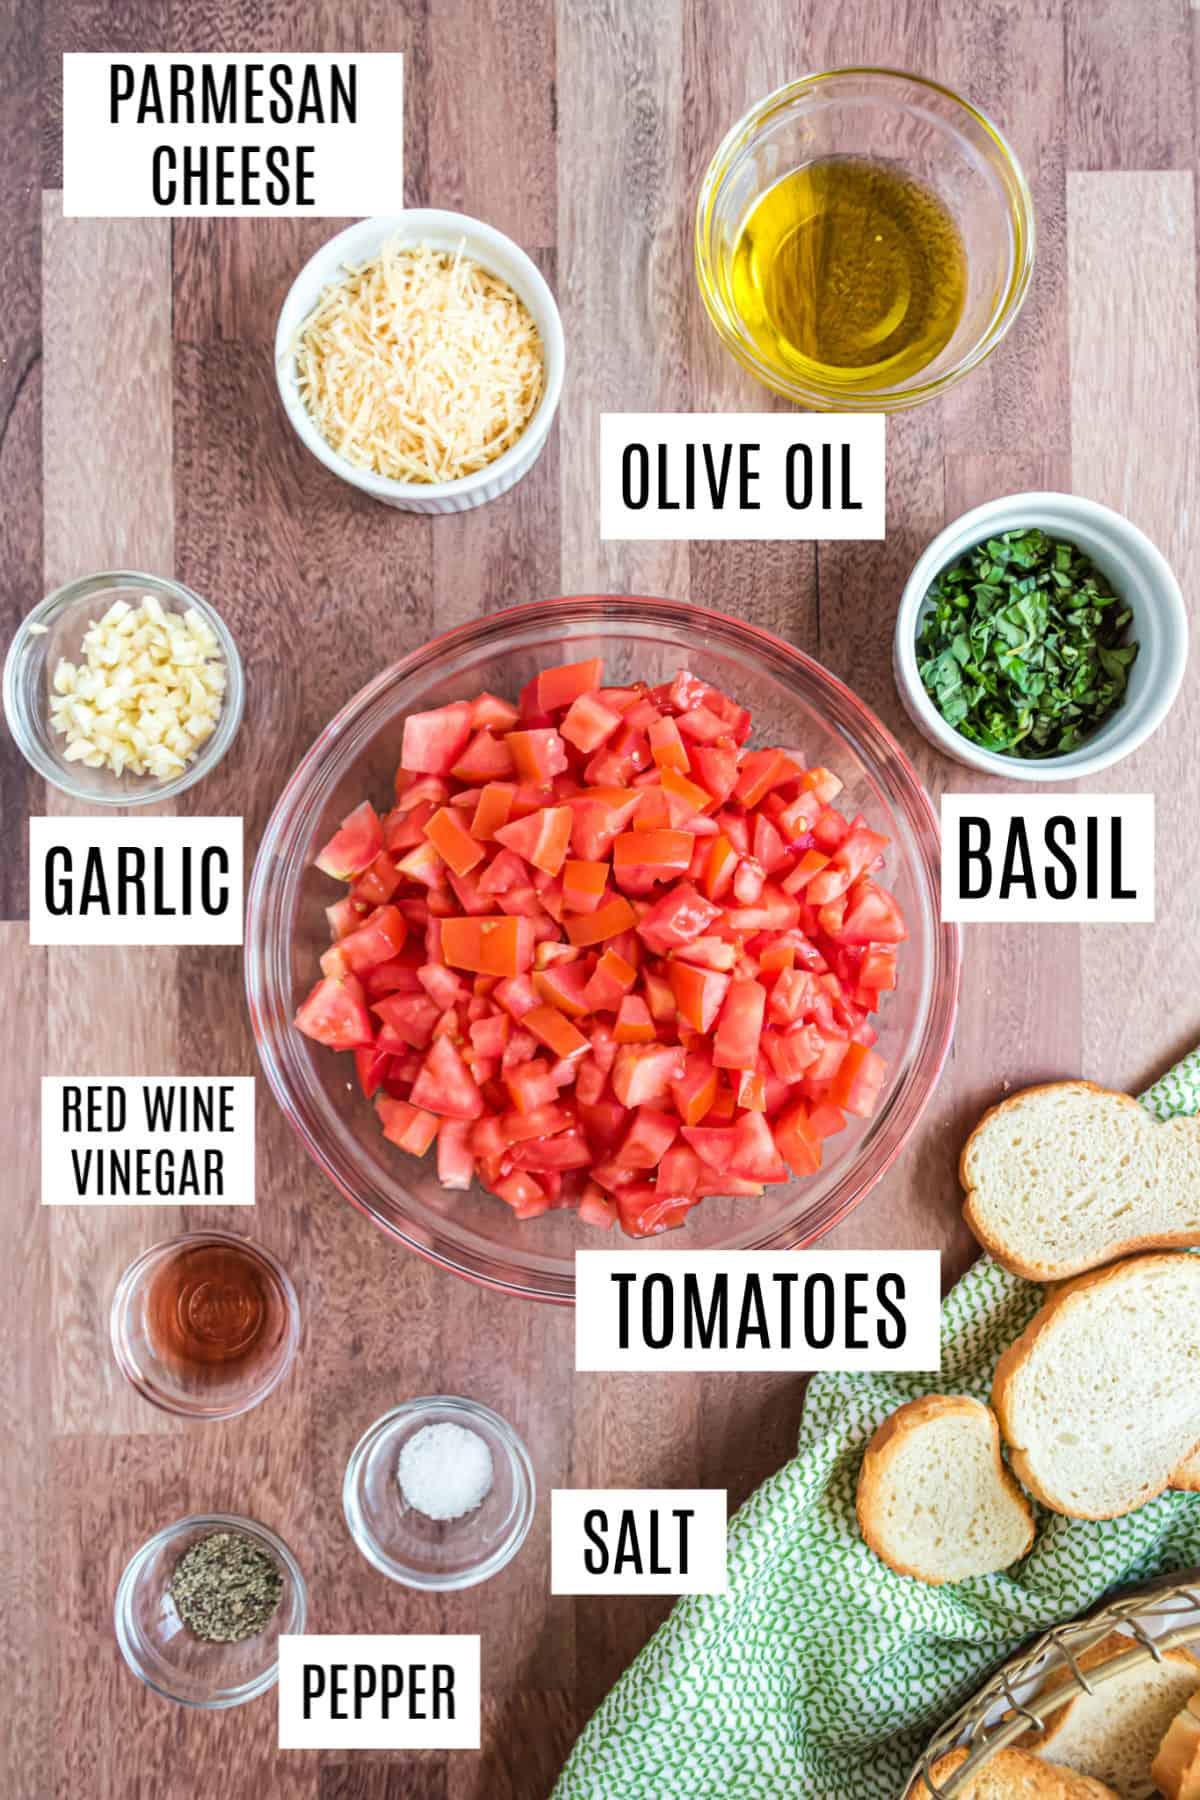 Ingredients needed for homemade bruschetta.